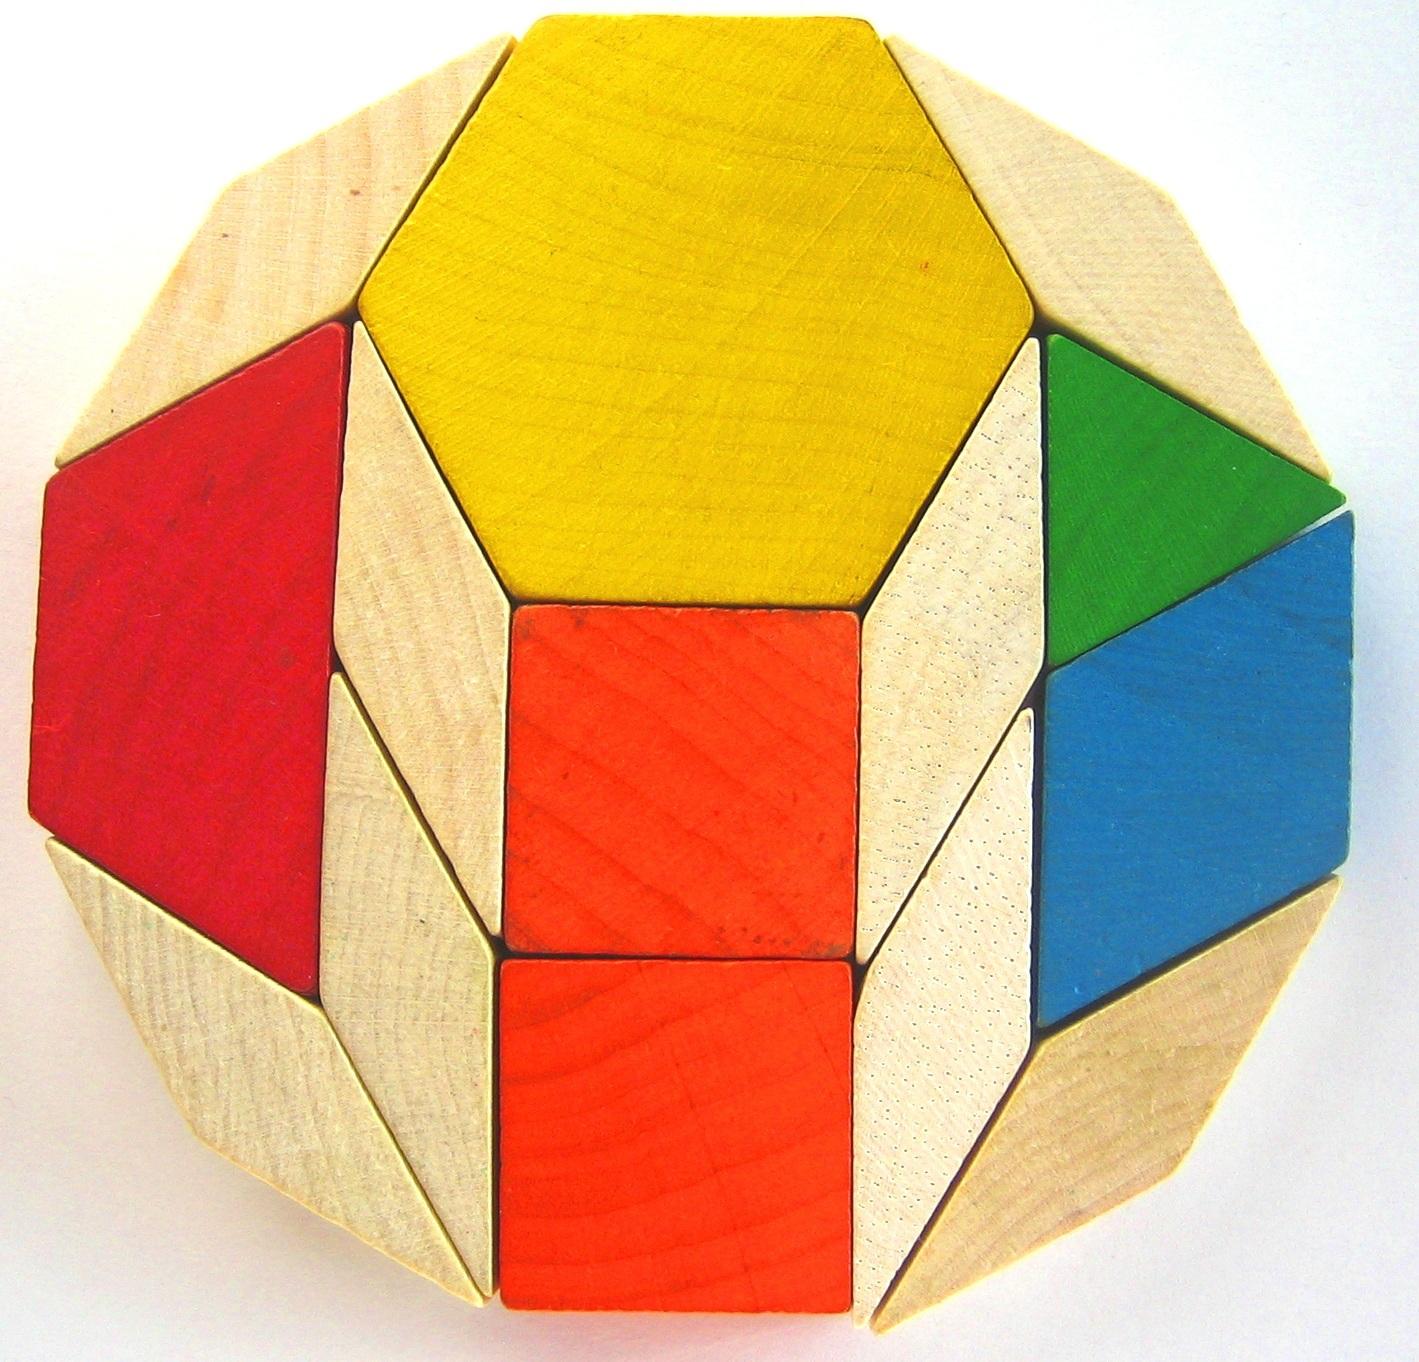 Wooden pattern blocks dodecagon